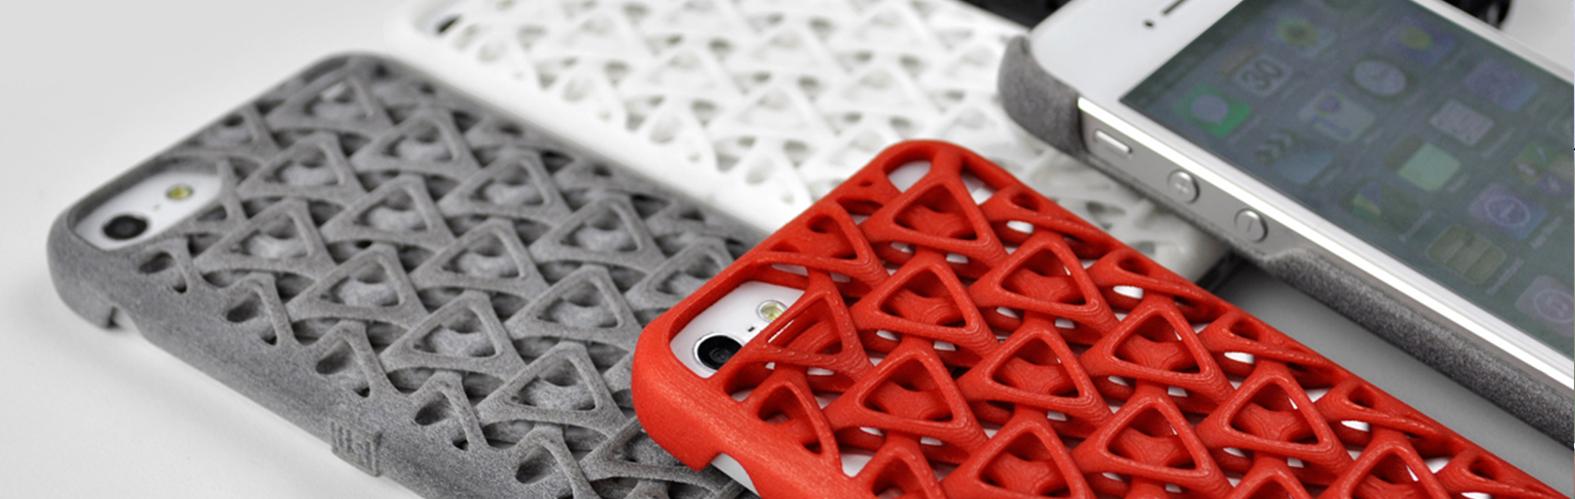 پرینت سه بعدی قاب گوشی